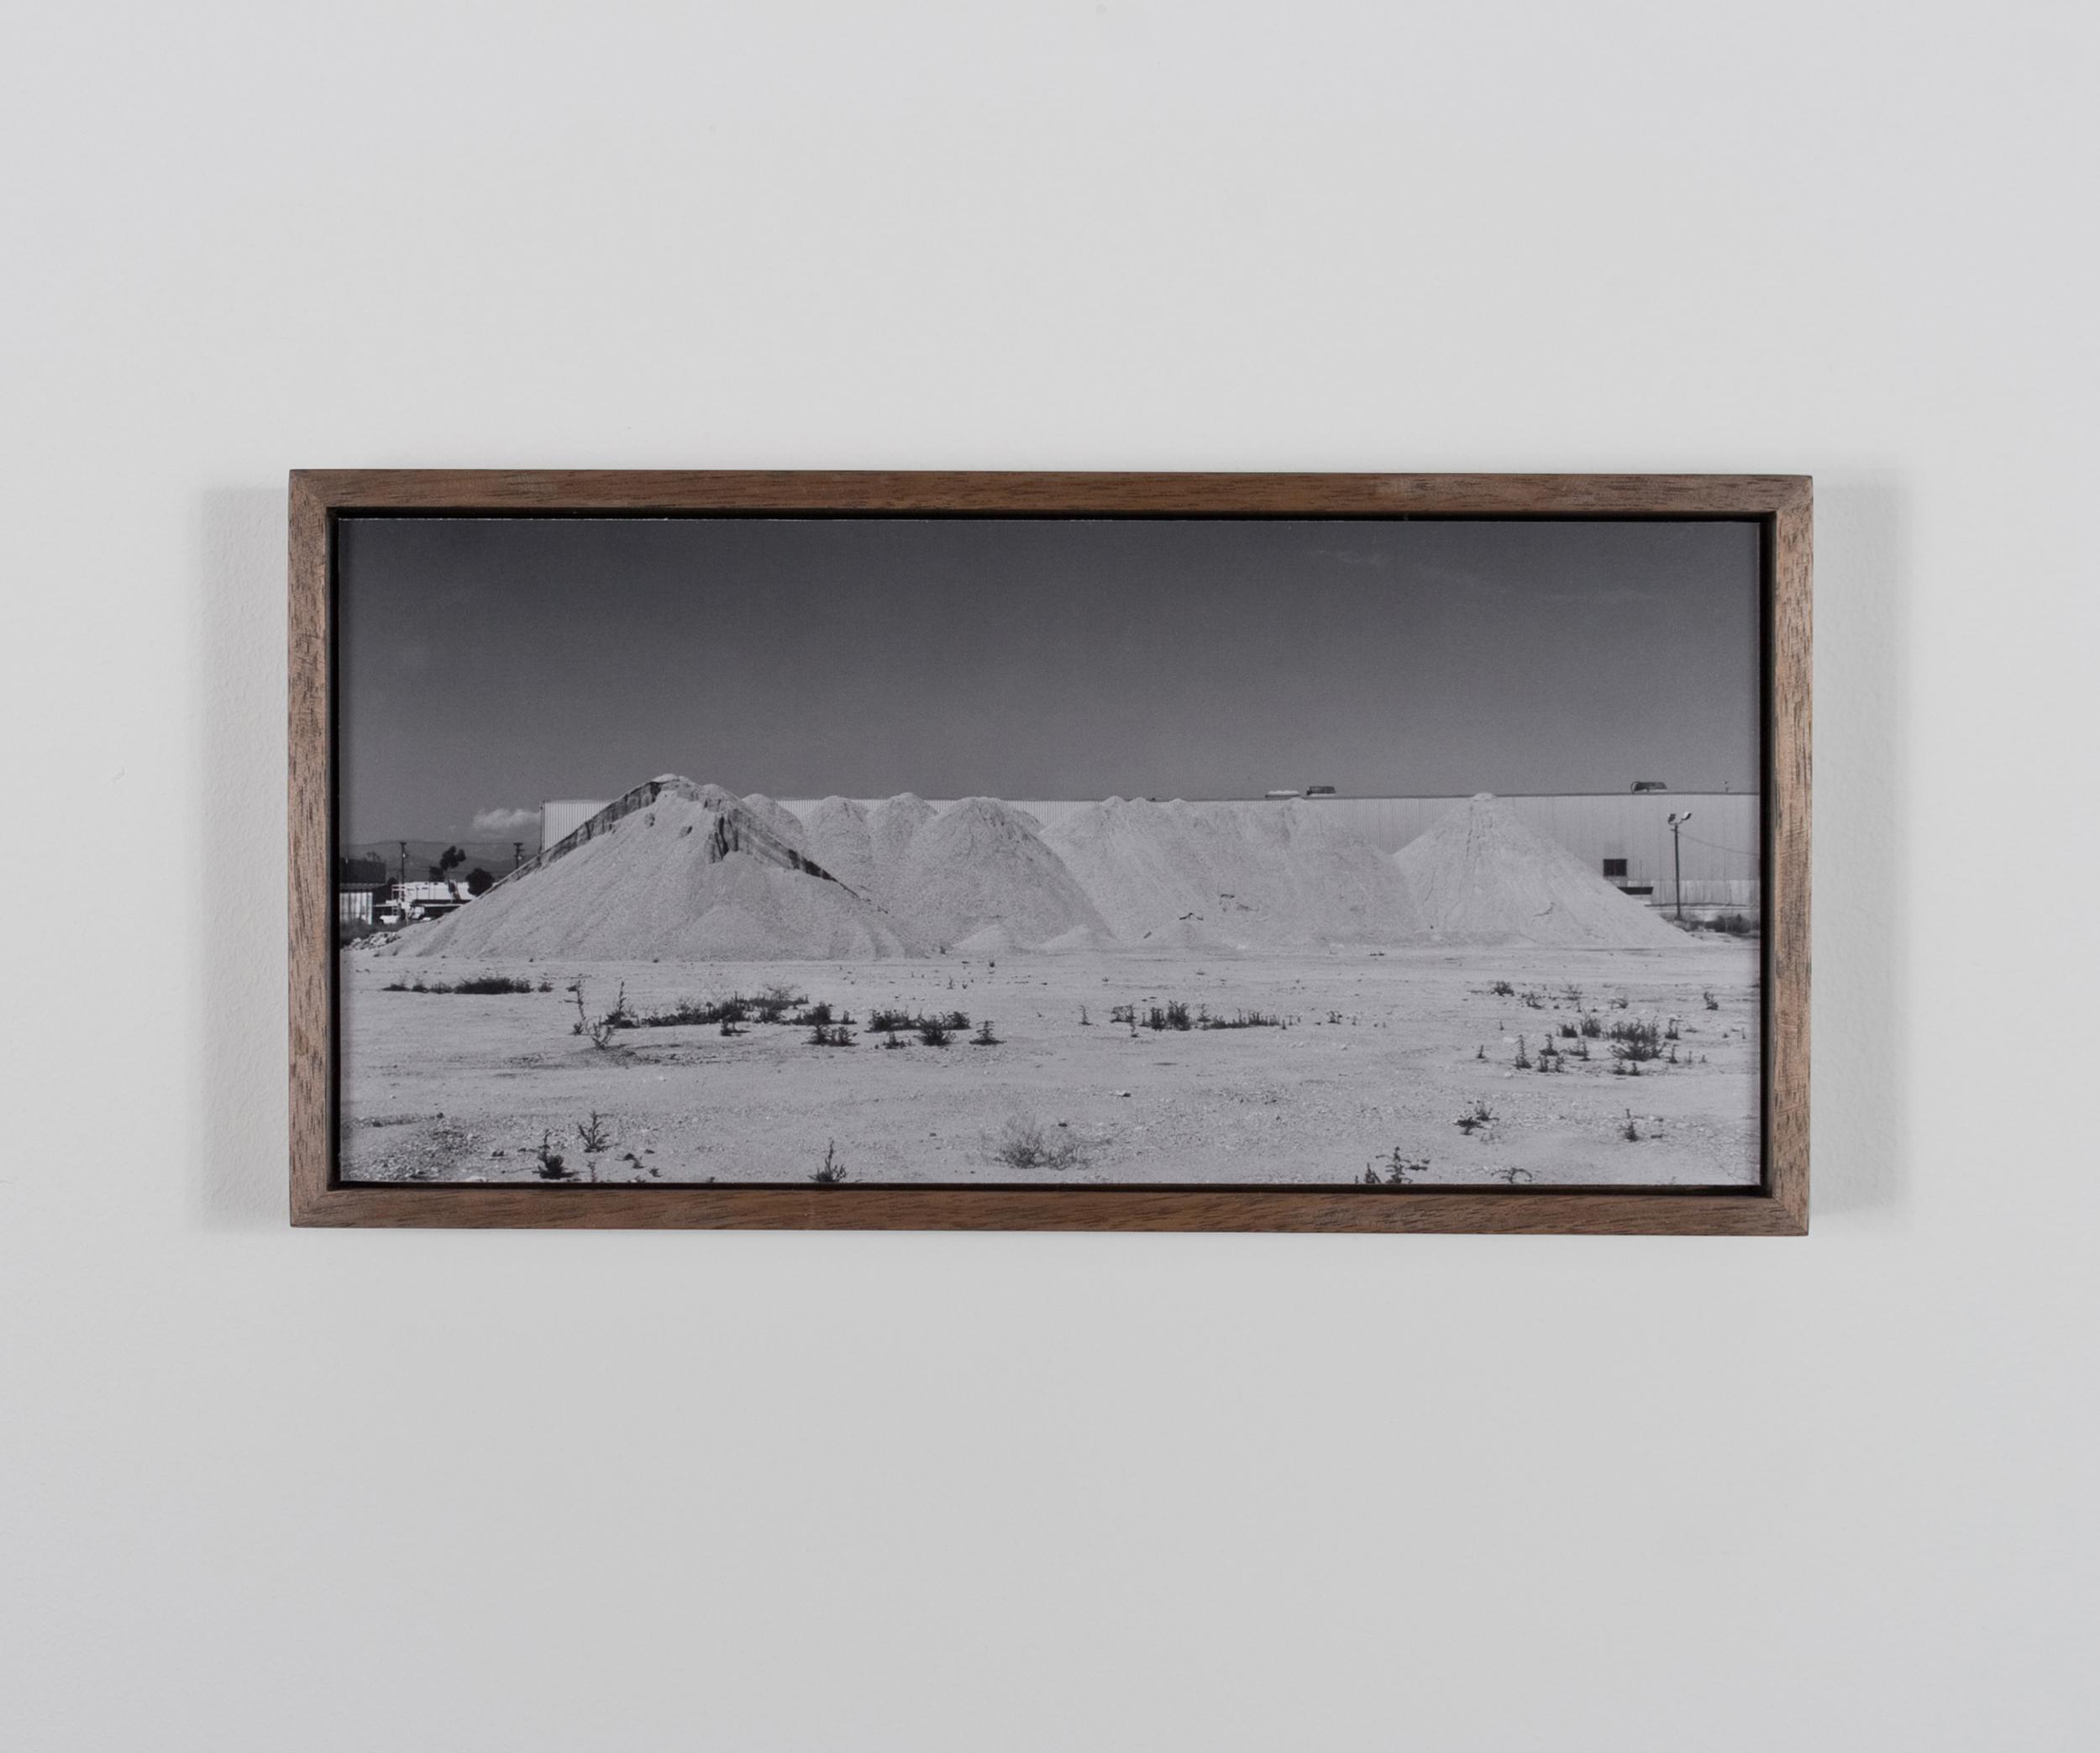 Telegraph Range (Sierra Telégrafo) 2009/10 Gelatin-silver print on Dibond, with walnut frame